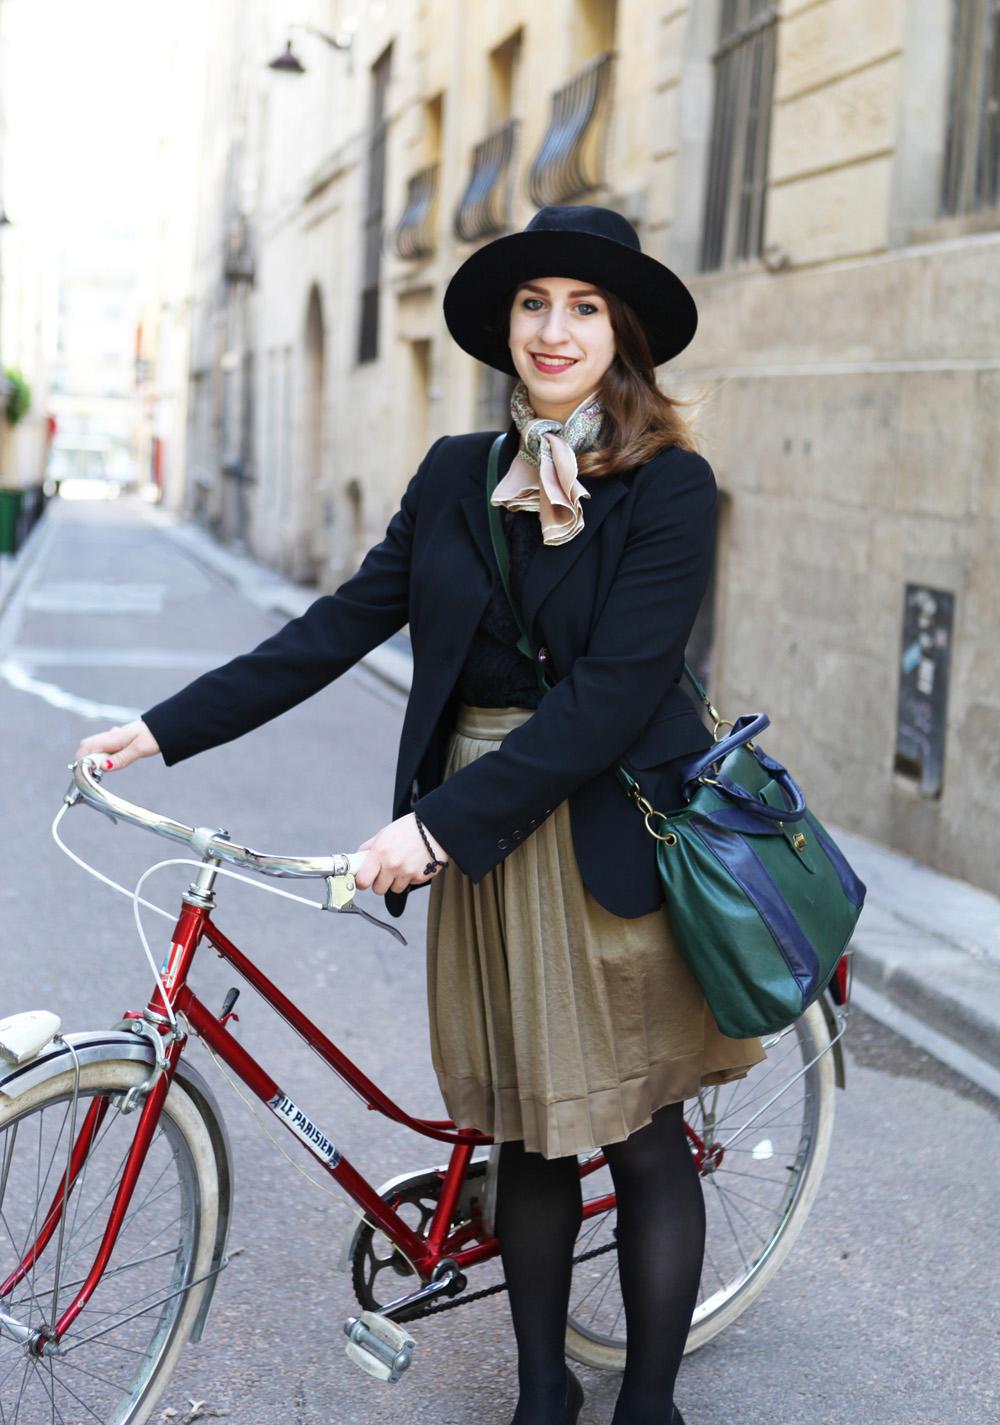 Beret baguette street style paris bike pretty - Frauen style ideen ...